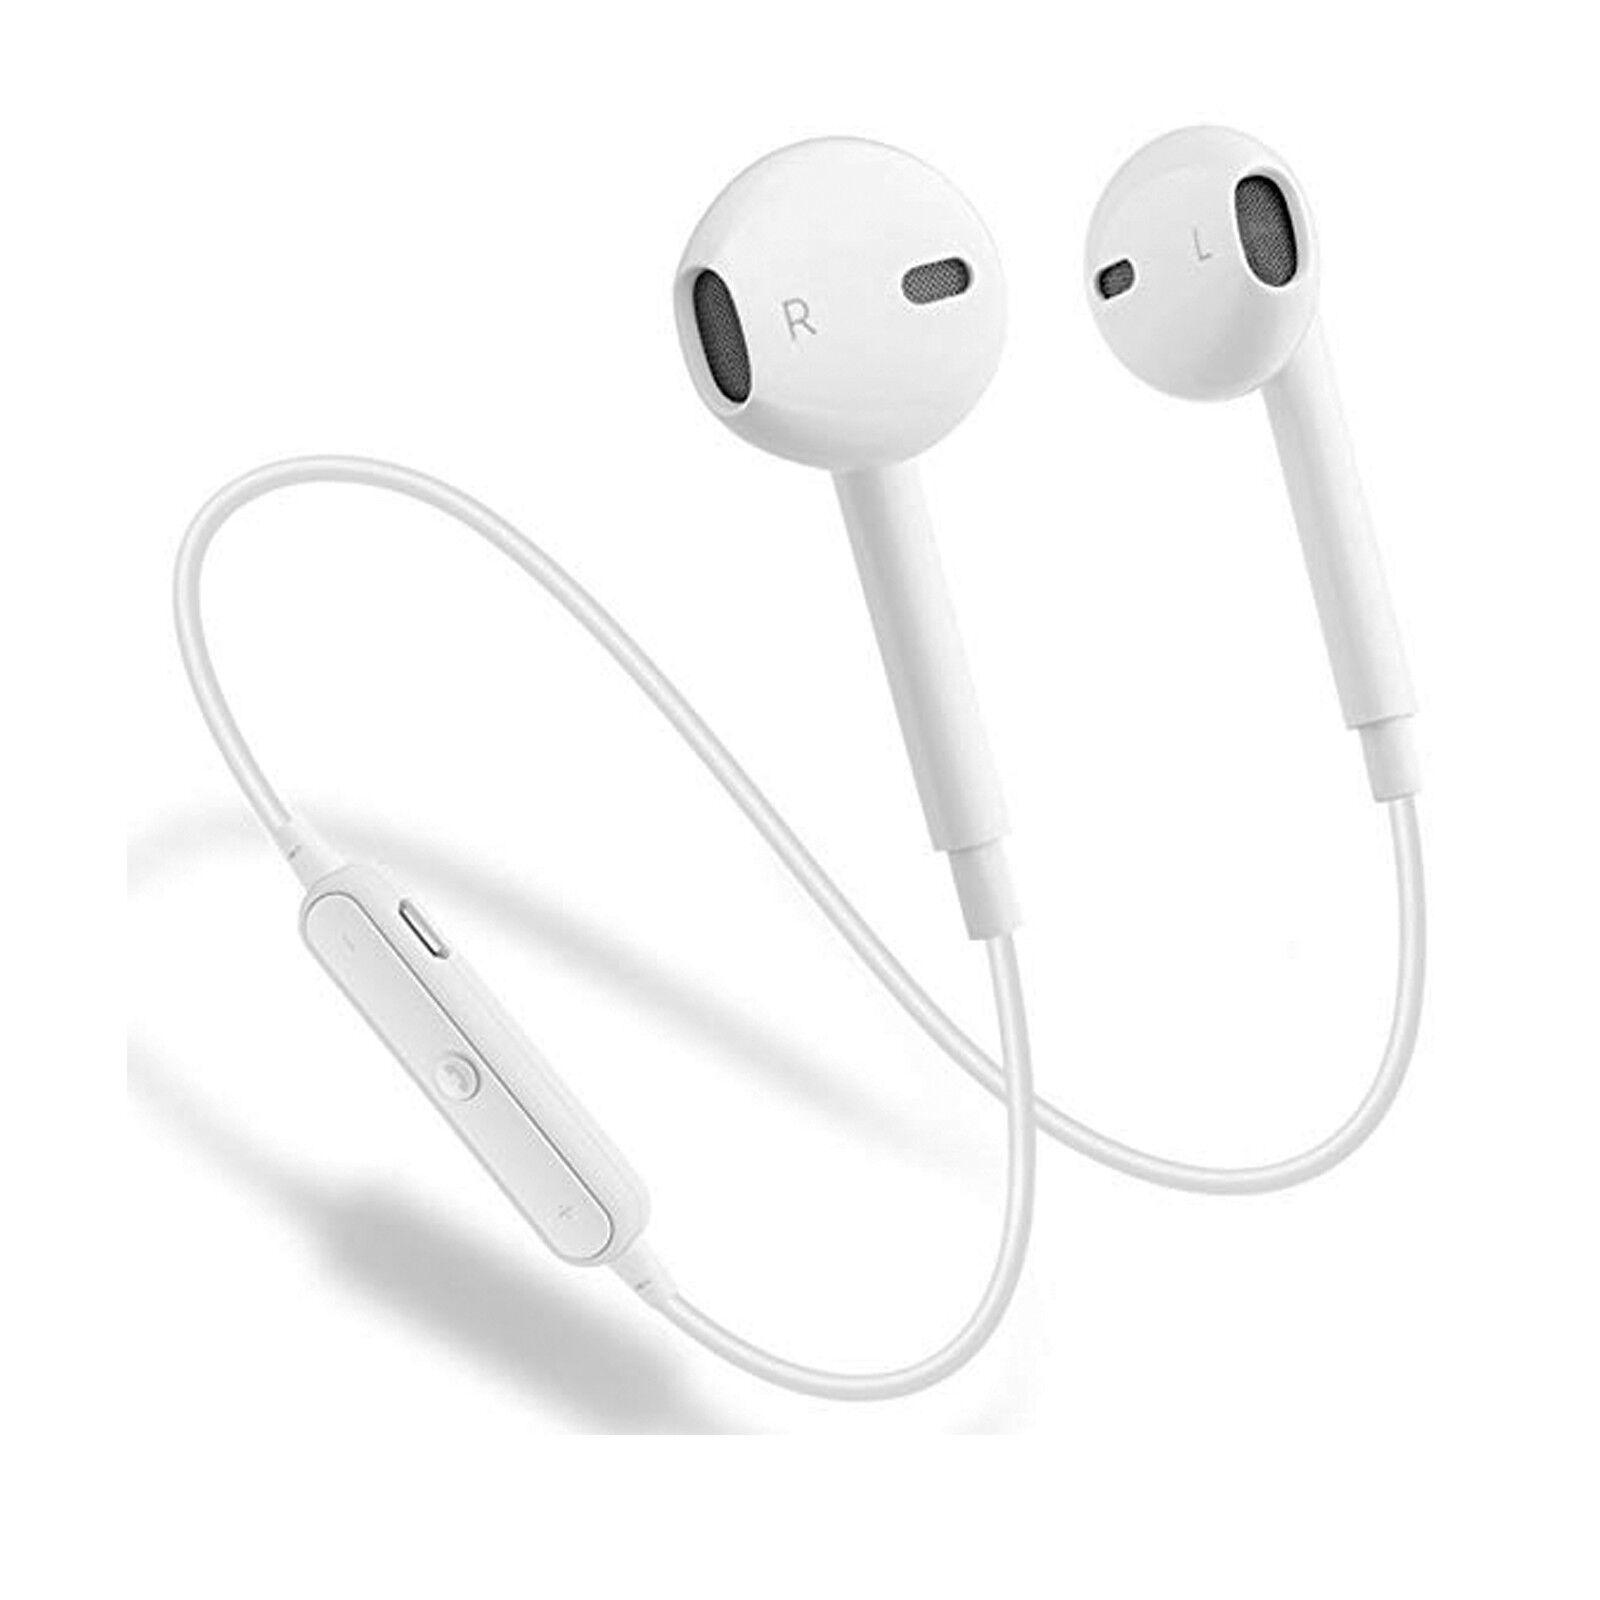 Bluetooth Wireless Headset Sport Headphones Stereo earphone earbuds with mic